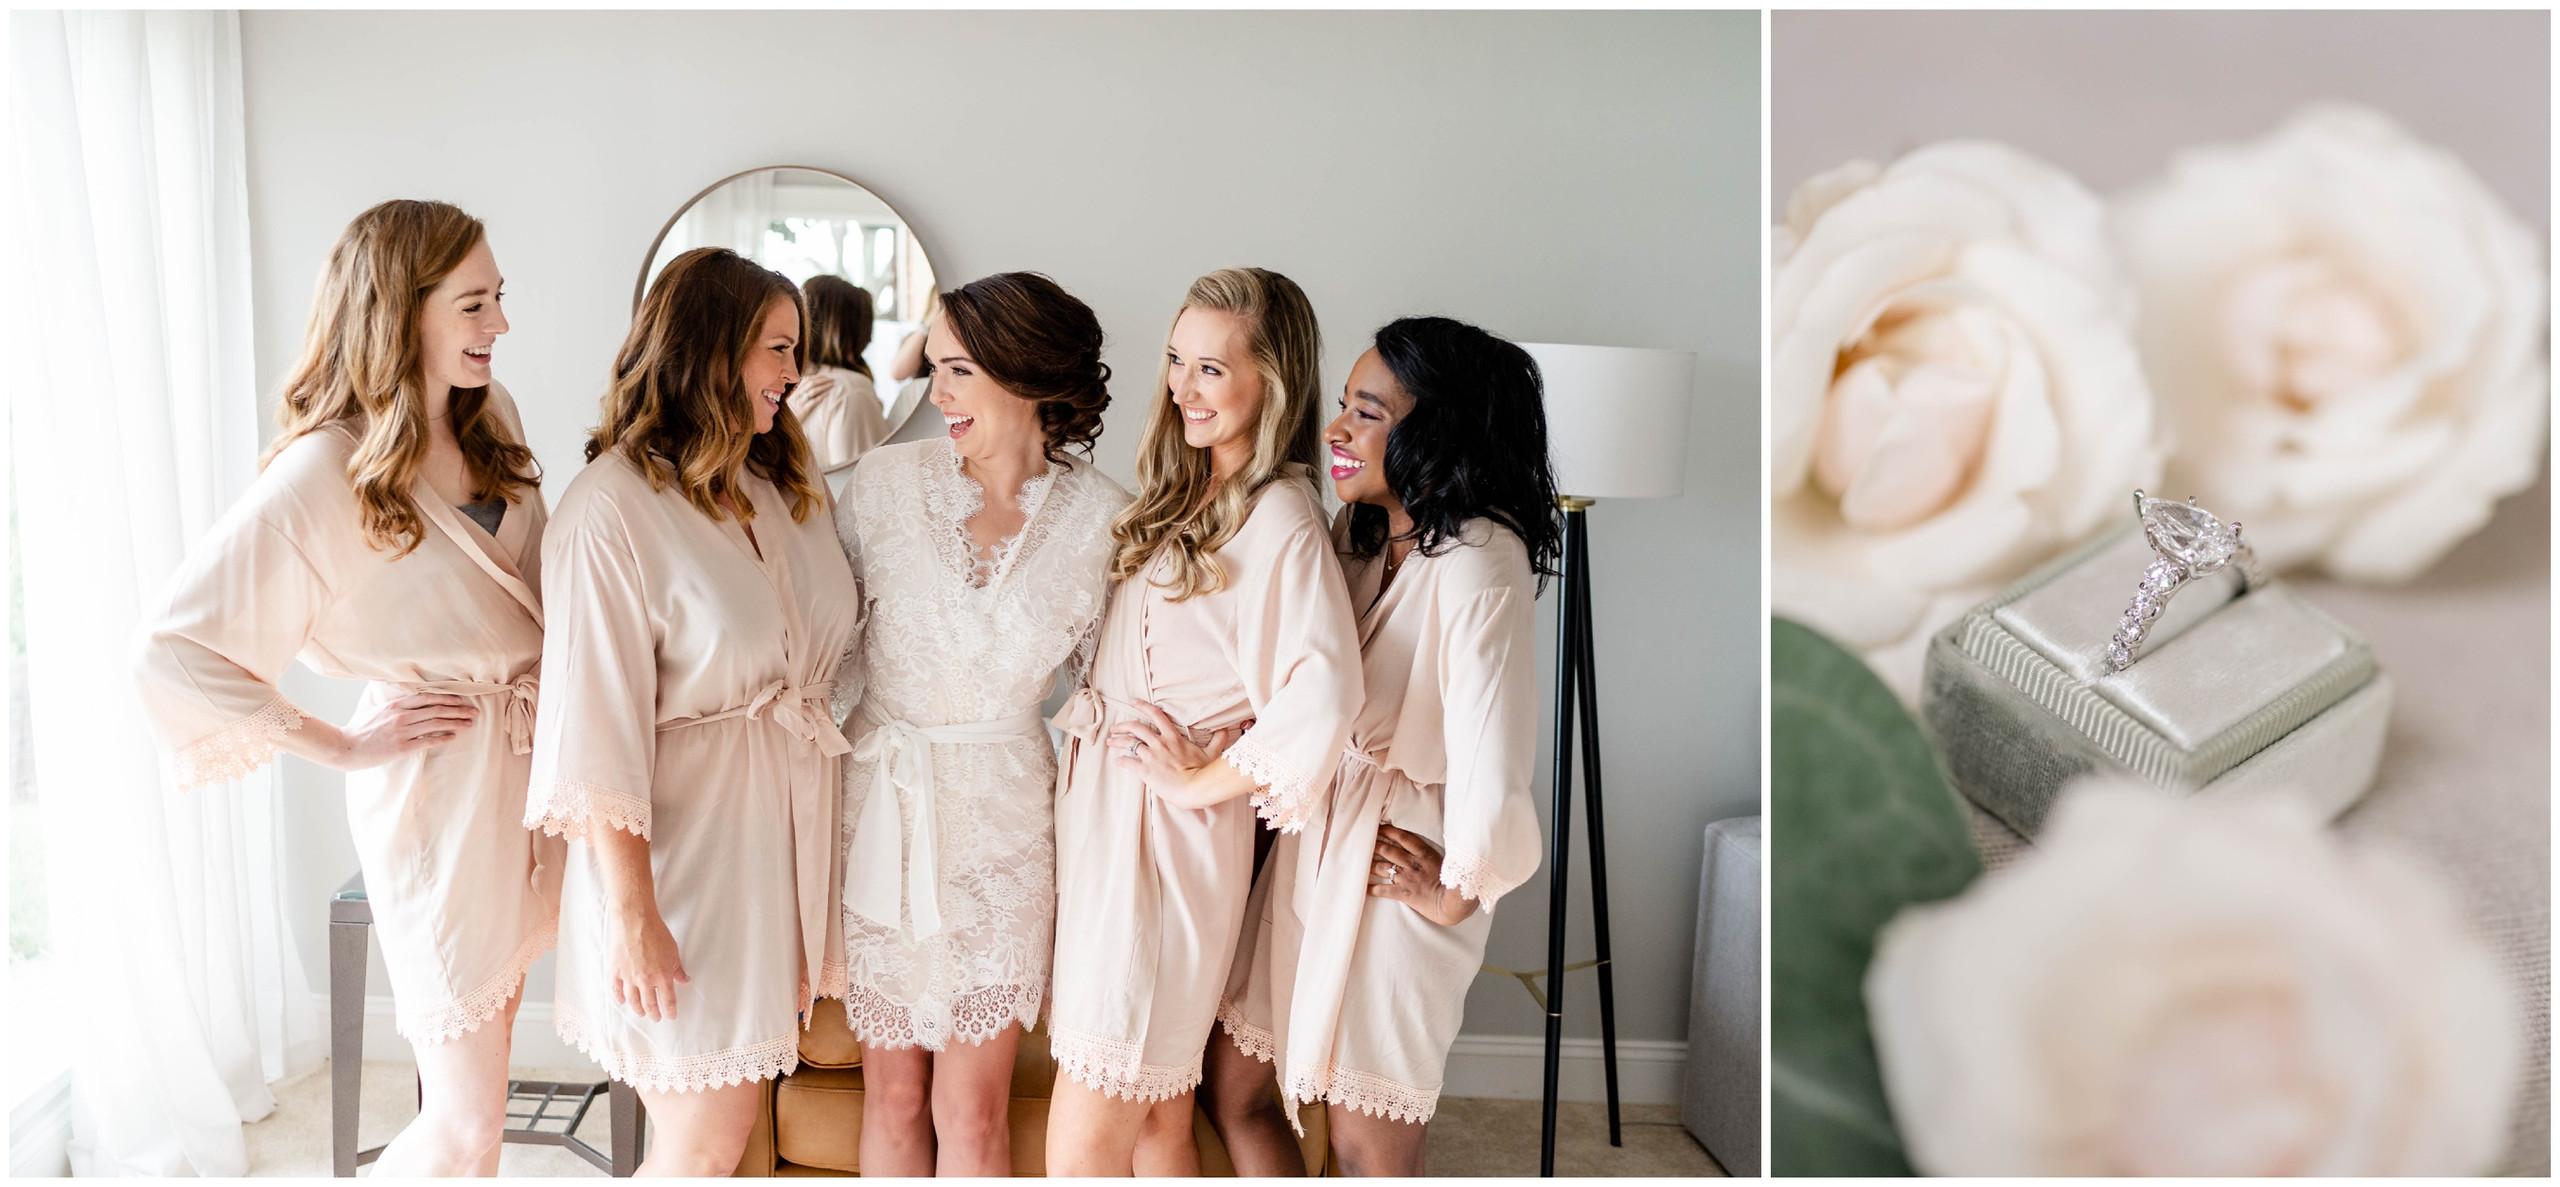 Bridesmaids-robe-photo